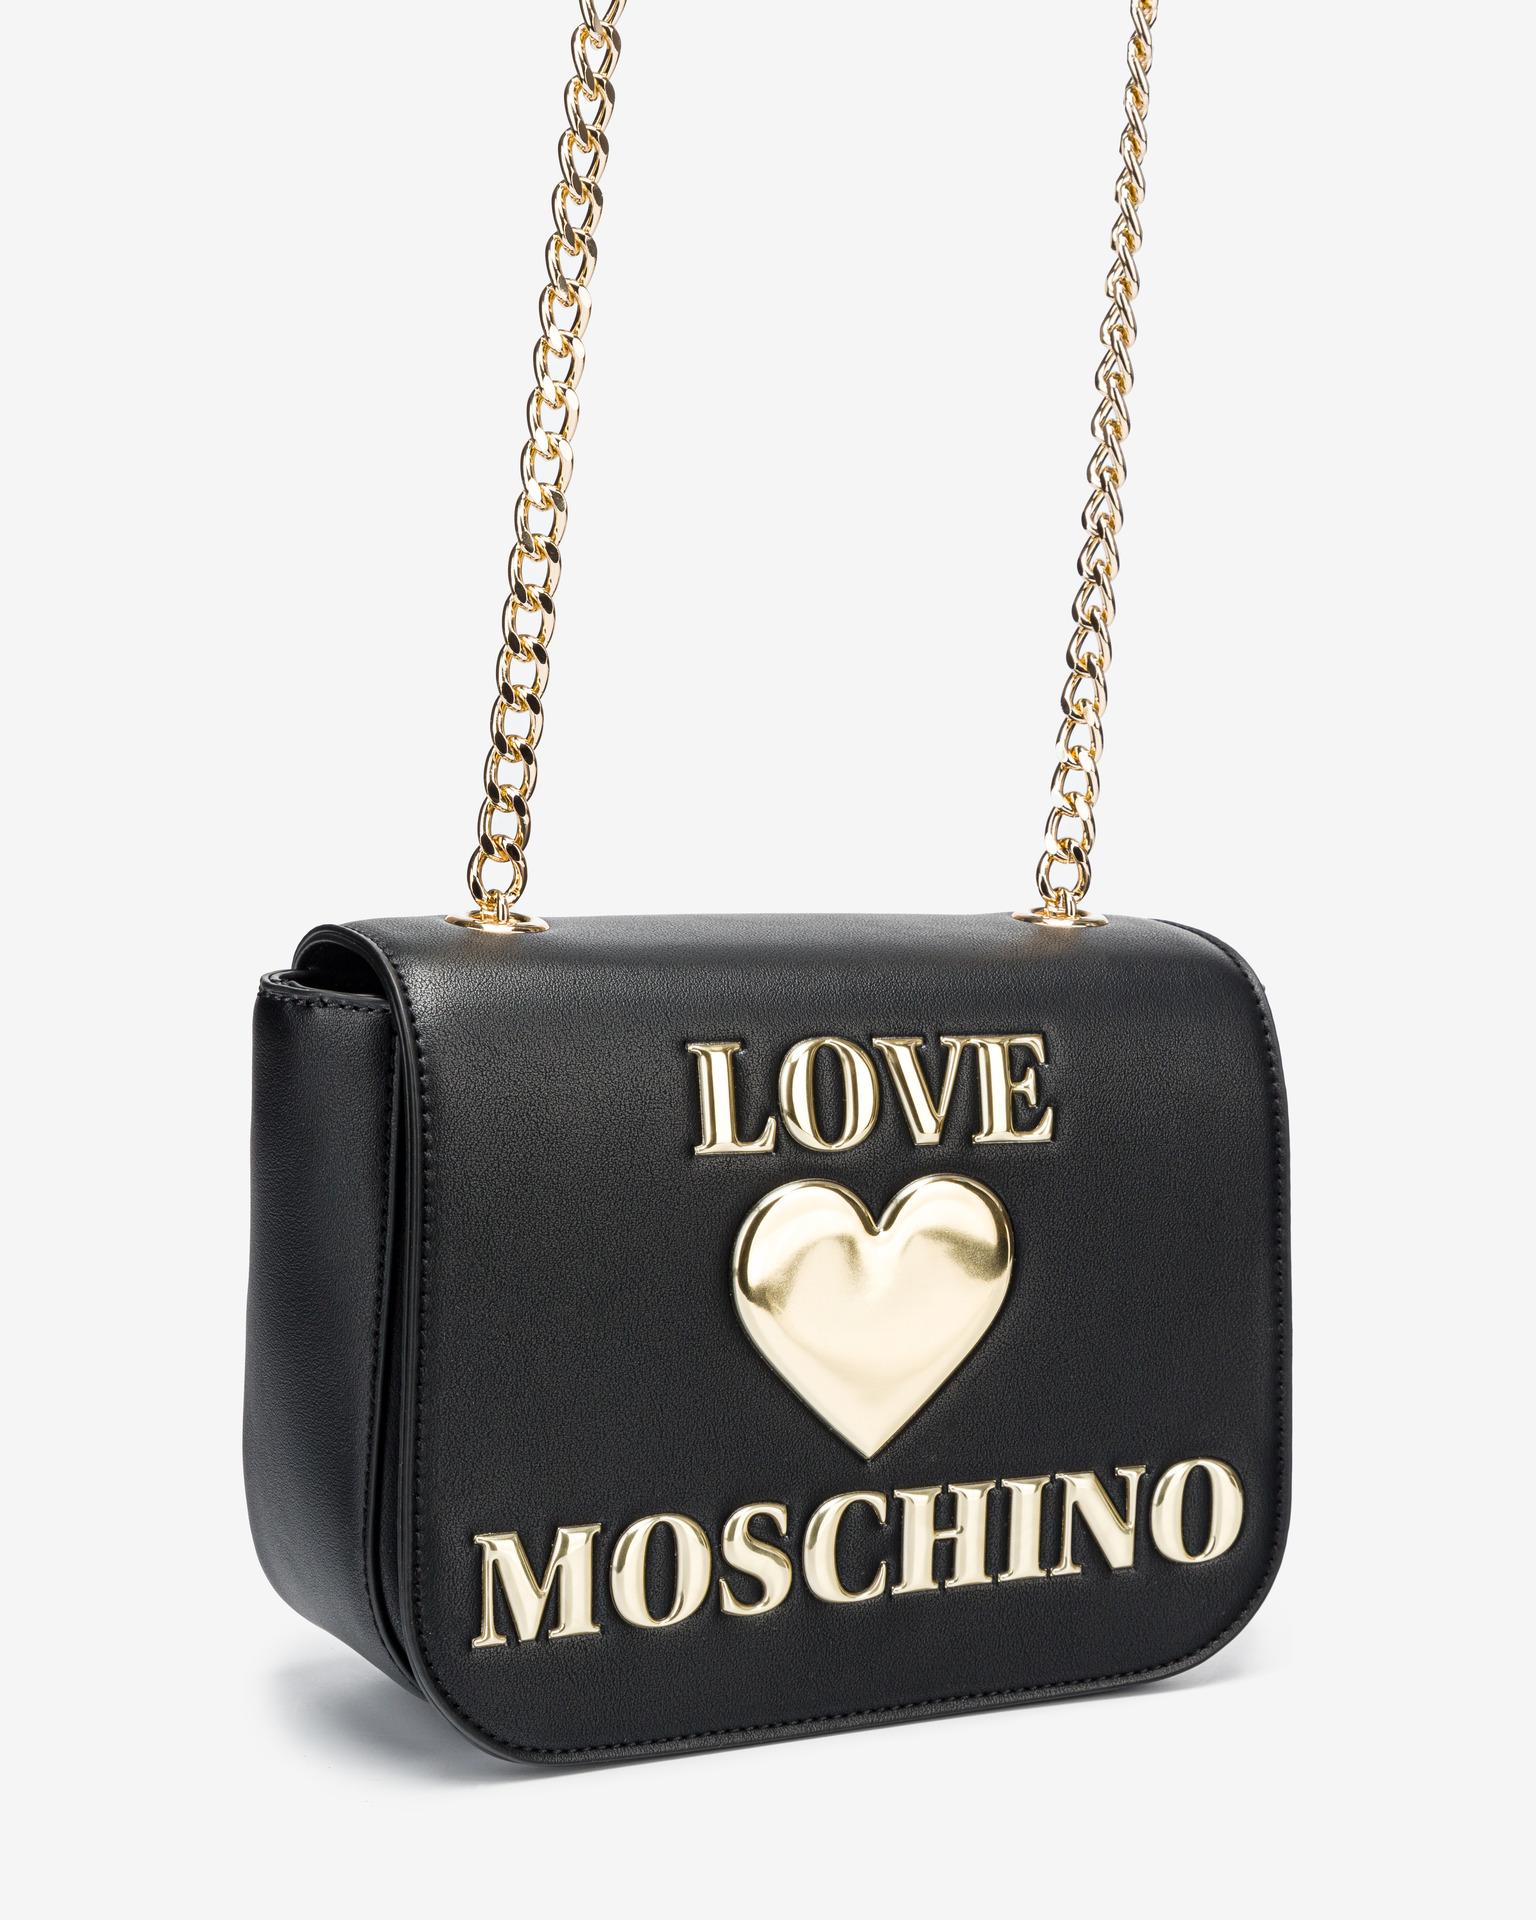 Love Moschino black crossbody handbag